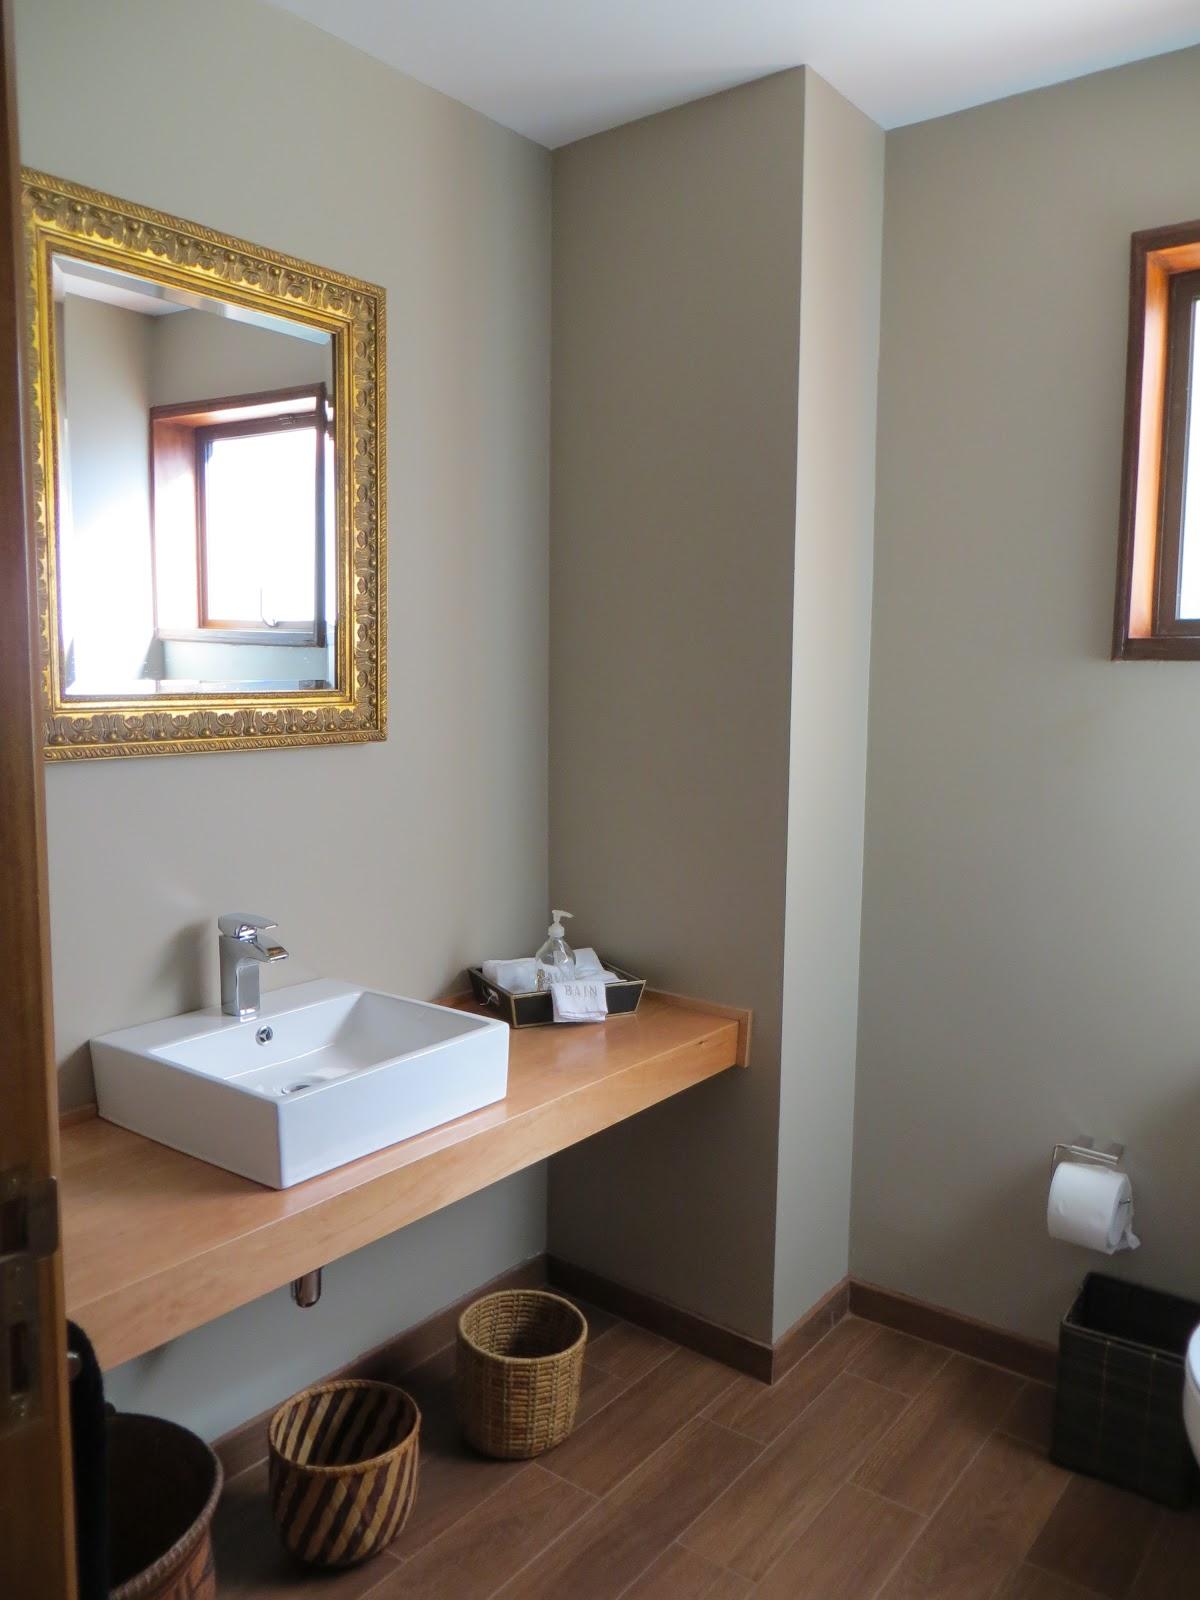 Baños Visita Modernos: adora: pequeño upgrade baño visita/ little upgrade guest bathroom